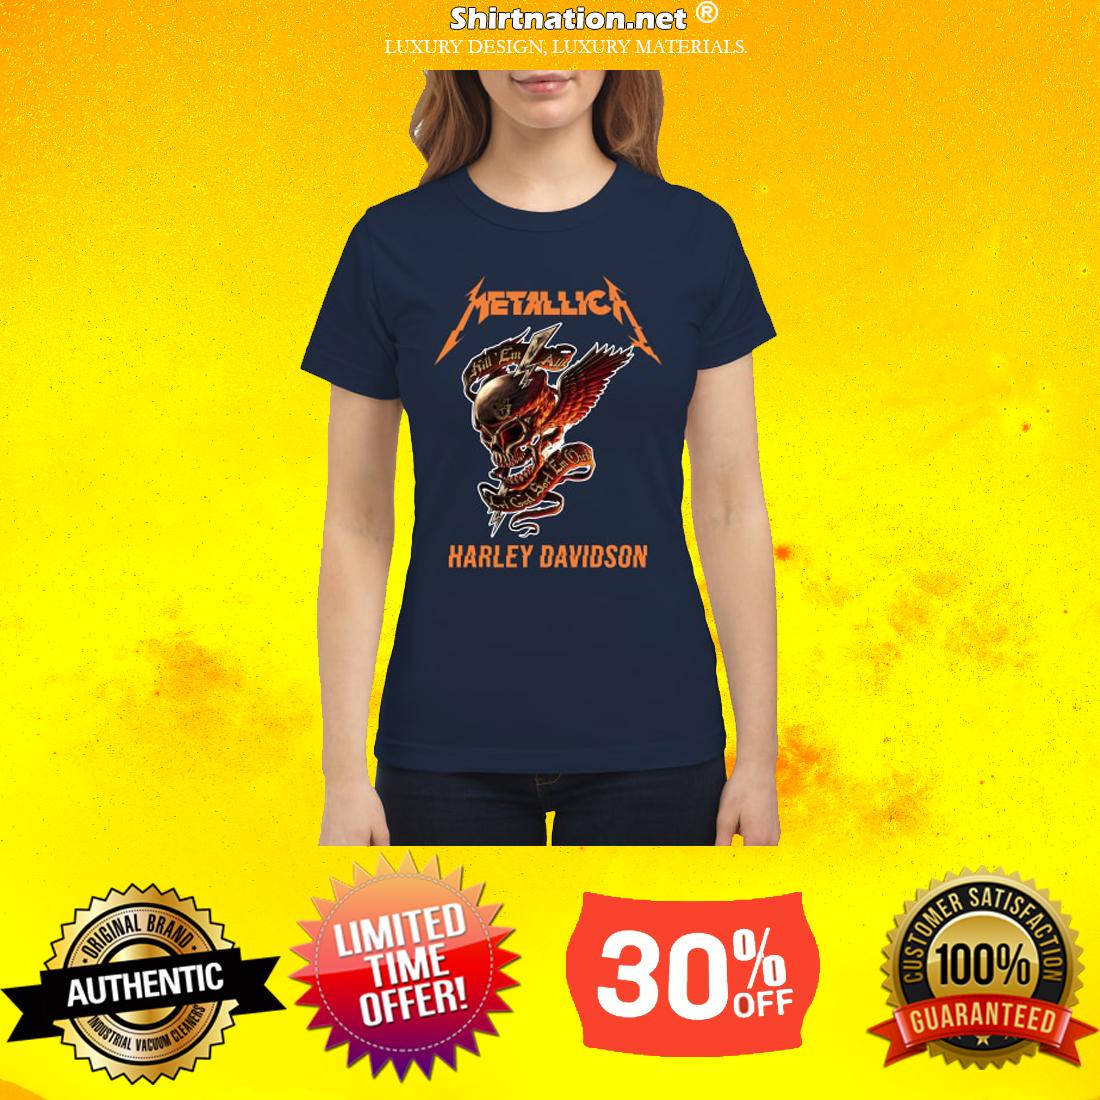 Skull Metallica Harley Davidson classic shirt